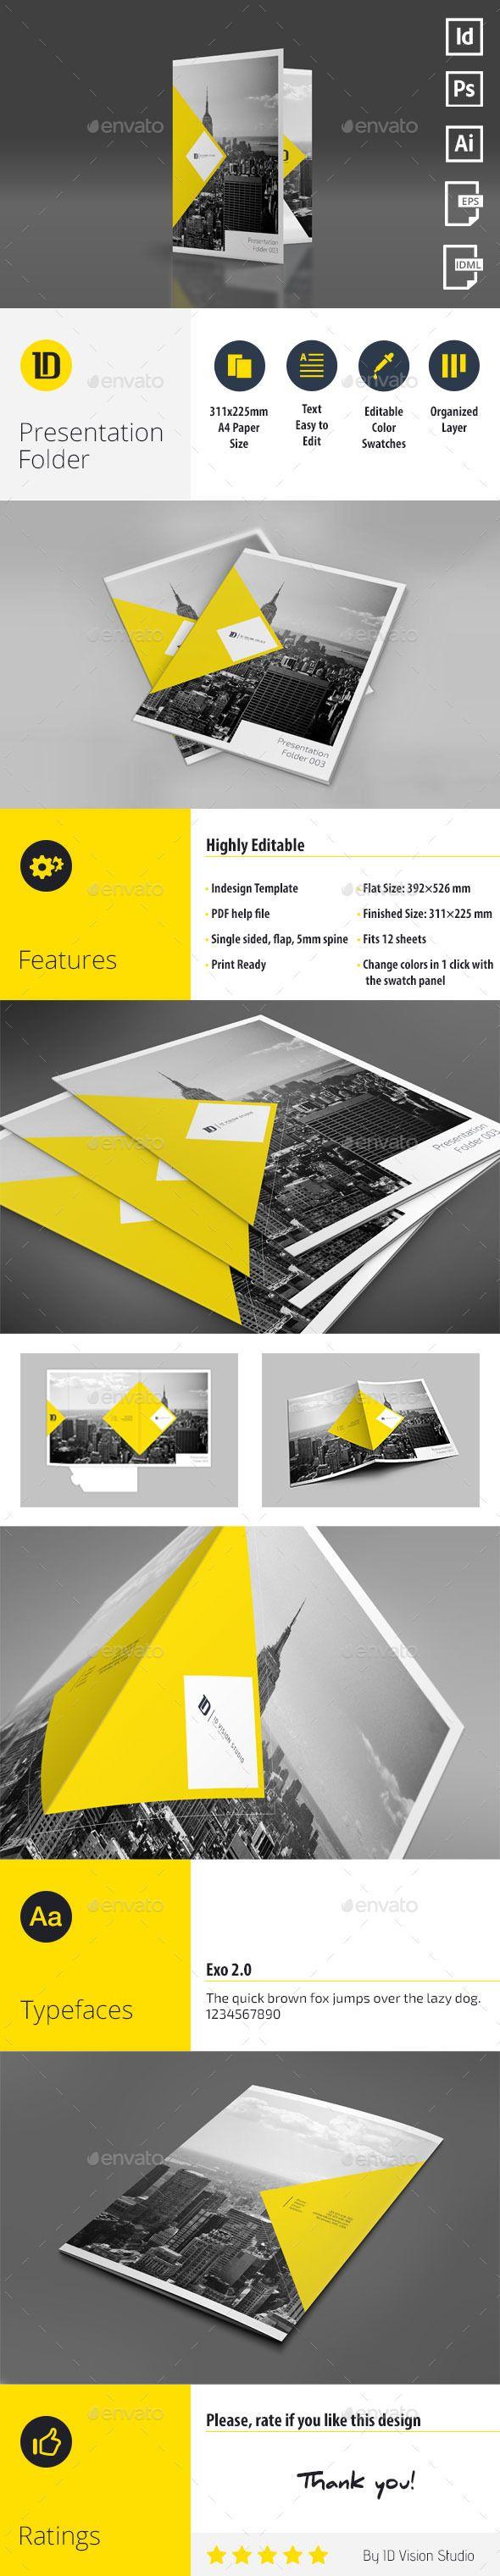 A4 Self Locking Multipurpose Presentation Folder 003 | Carpetas ...